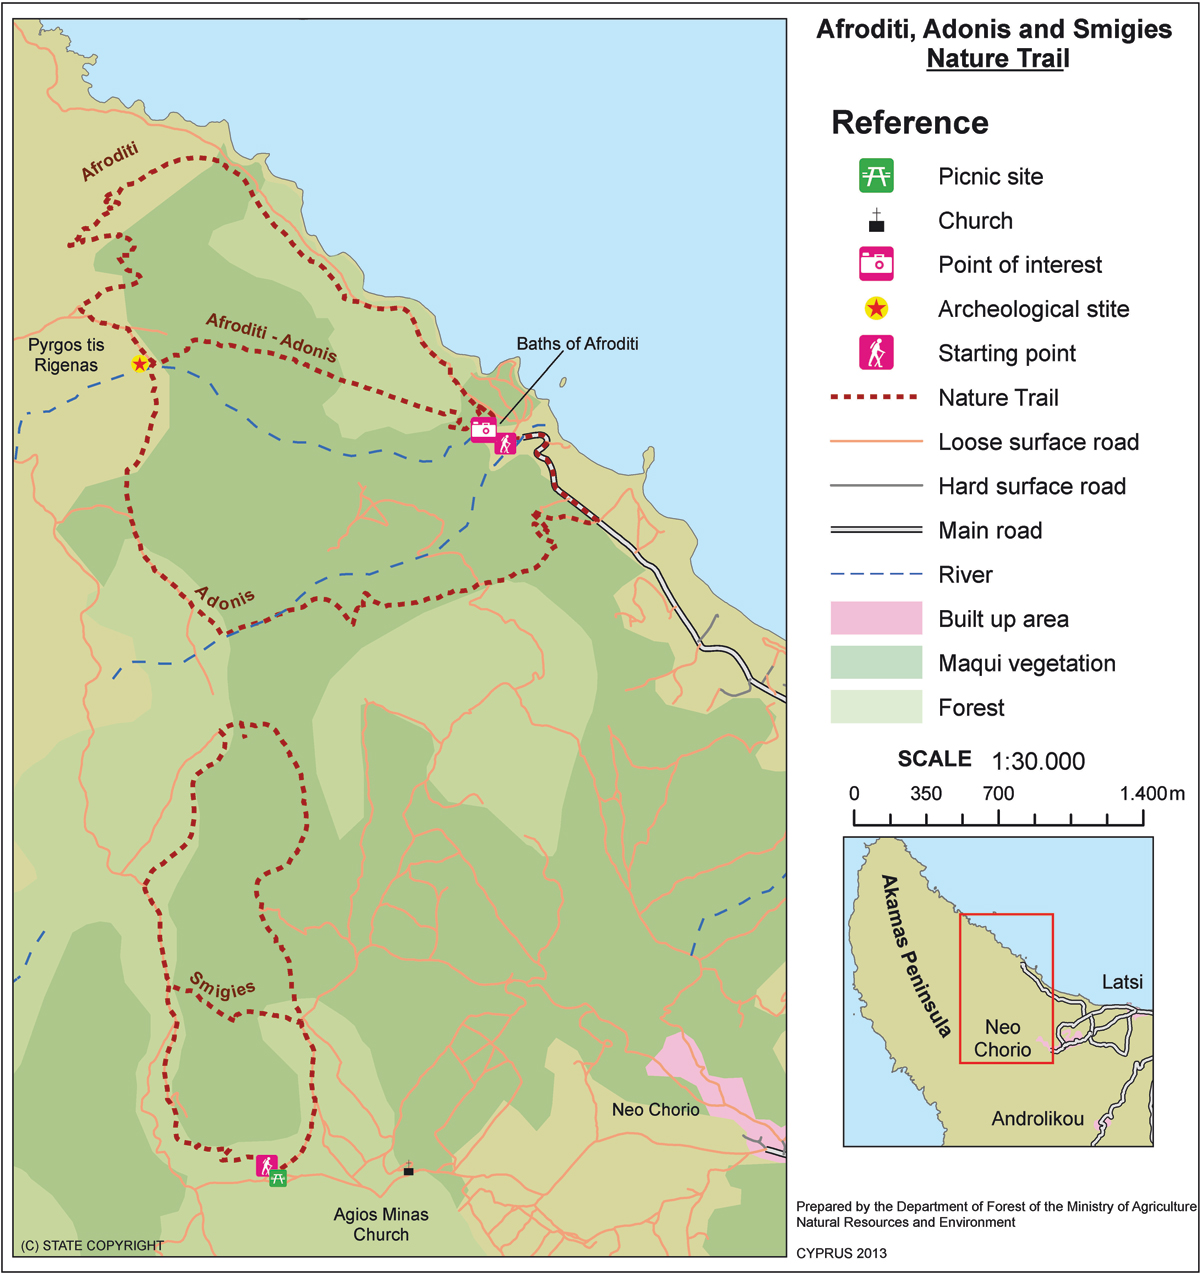 тропа Адониса карта